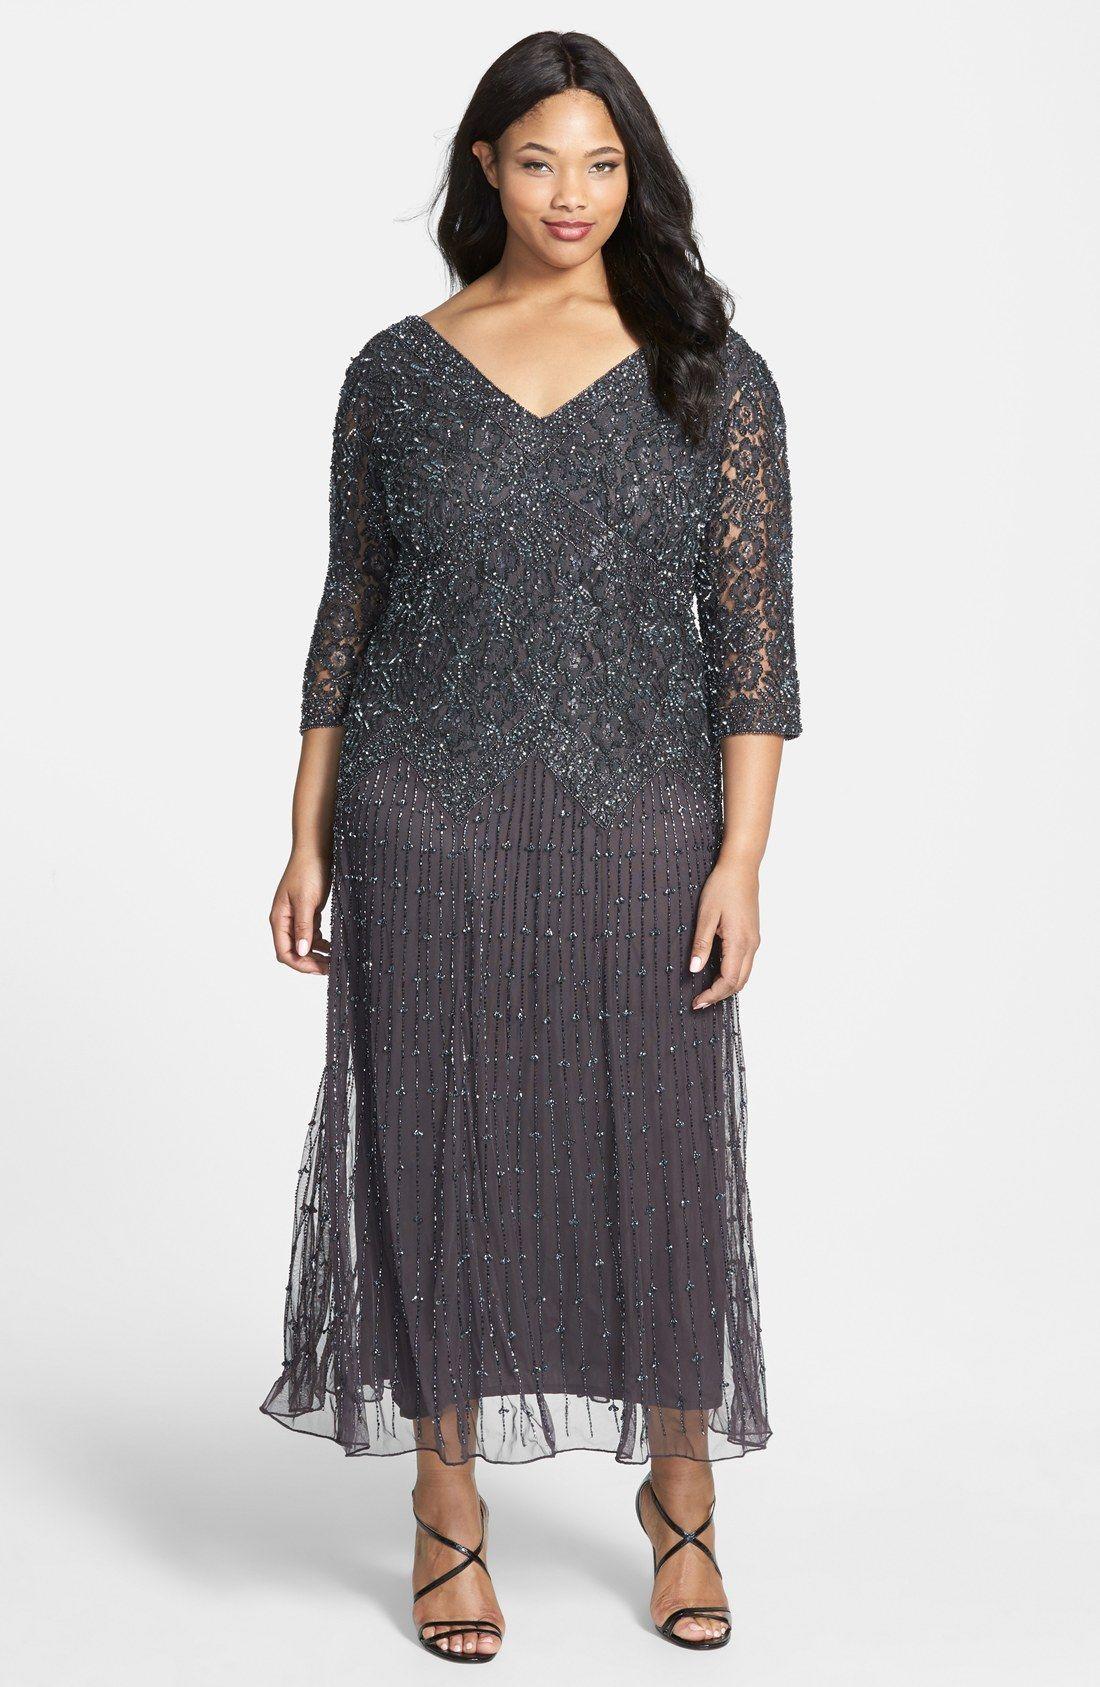 Nordstrom Prom Dresses Plus Size | Hut Bar